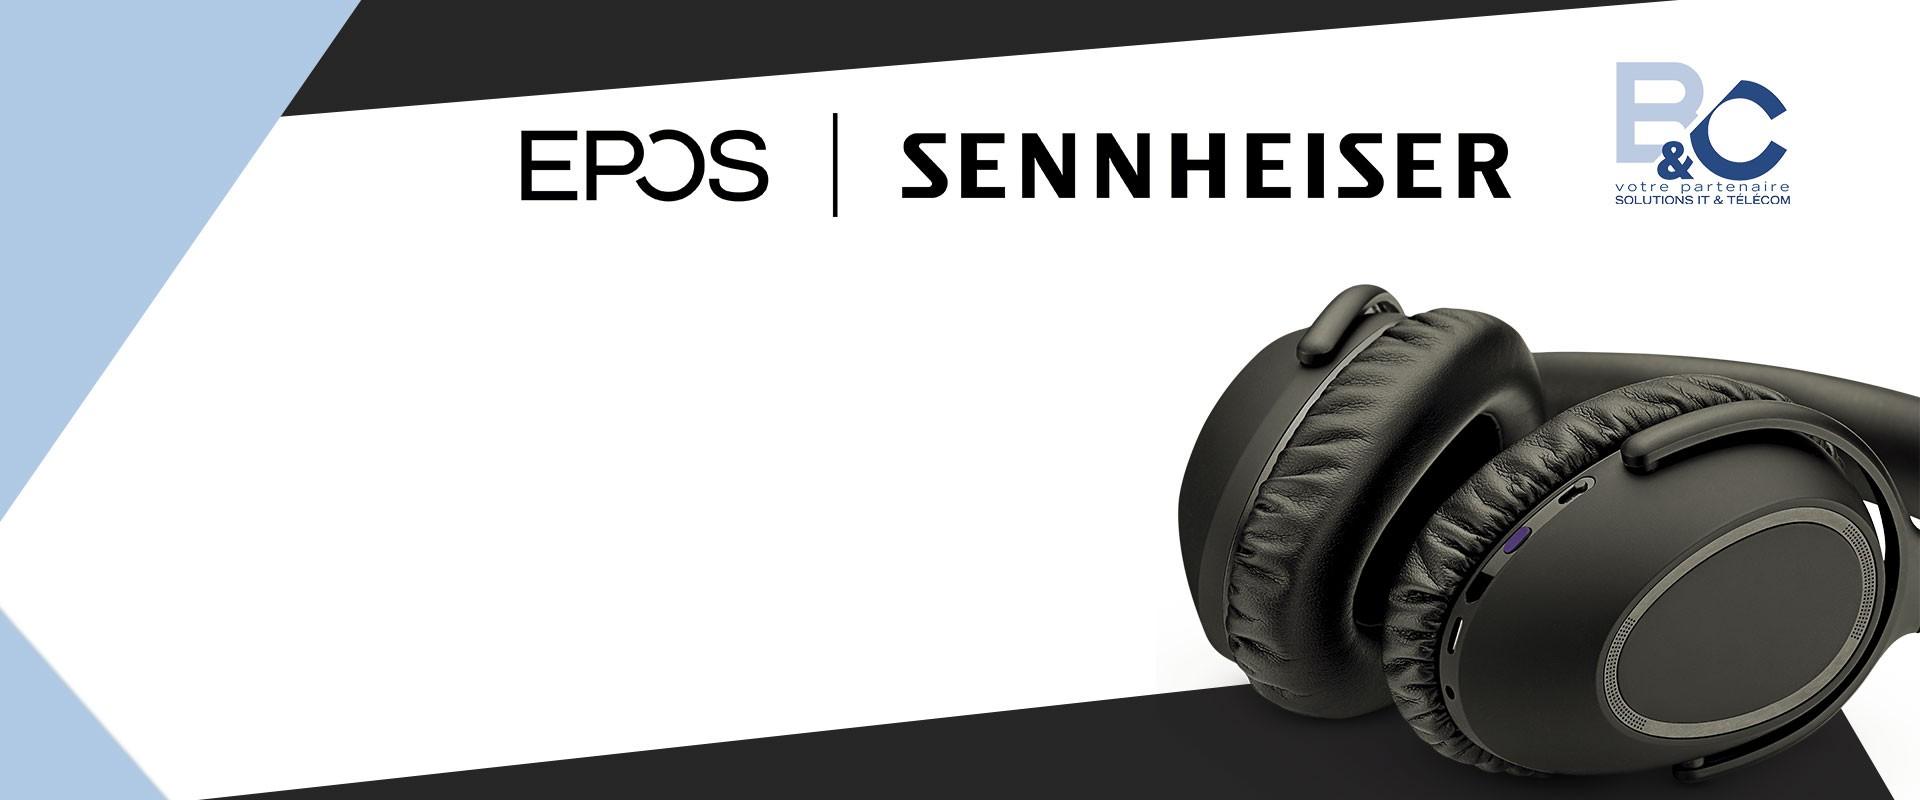 Epos Sennheiser gamme evolve2